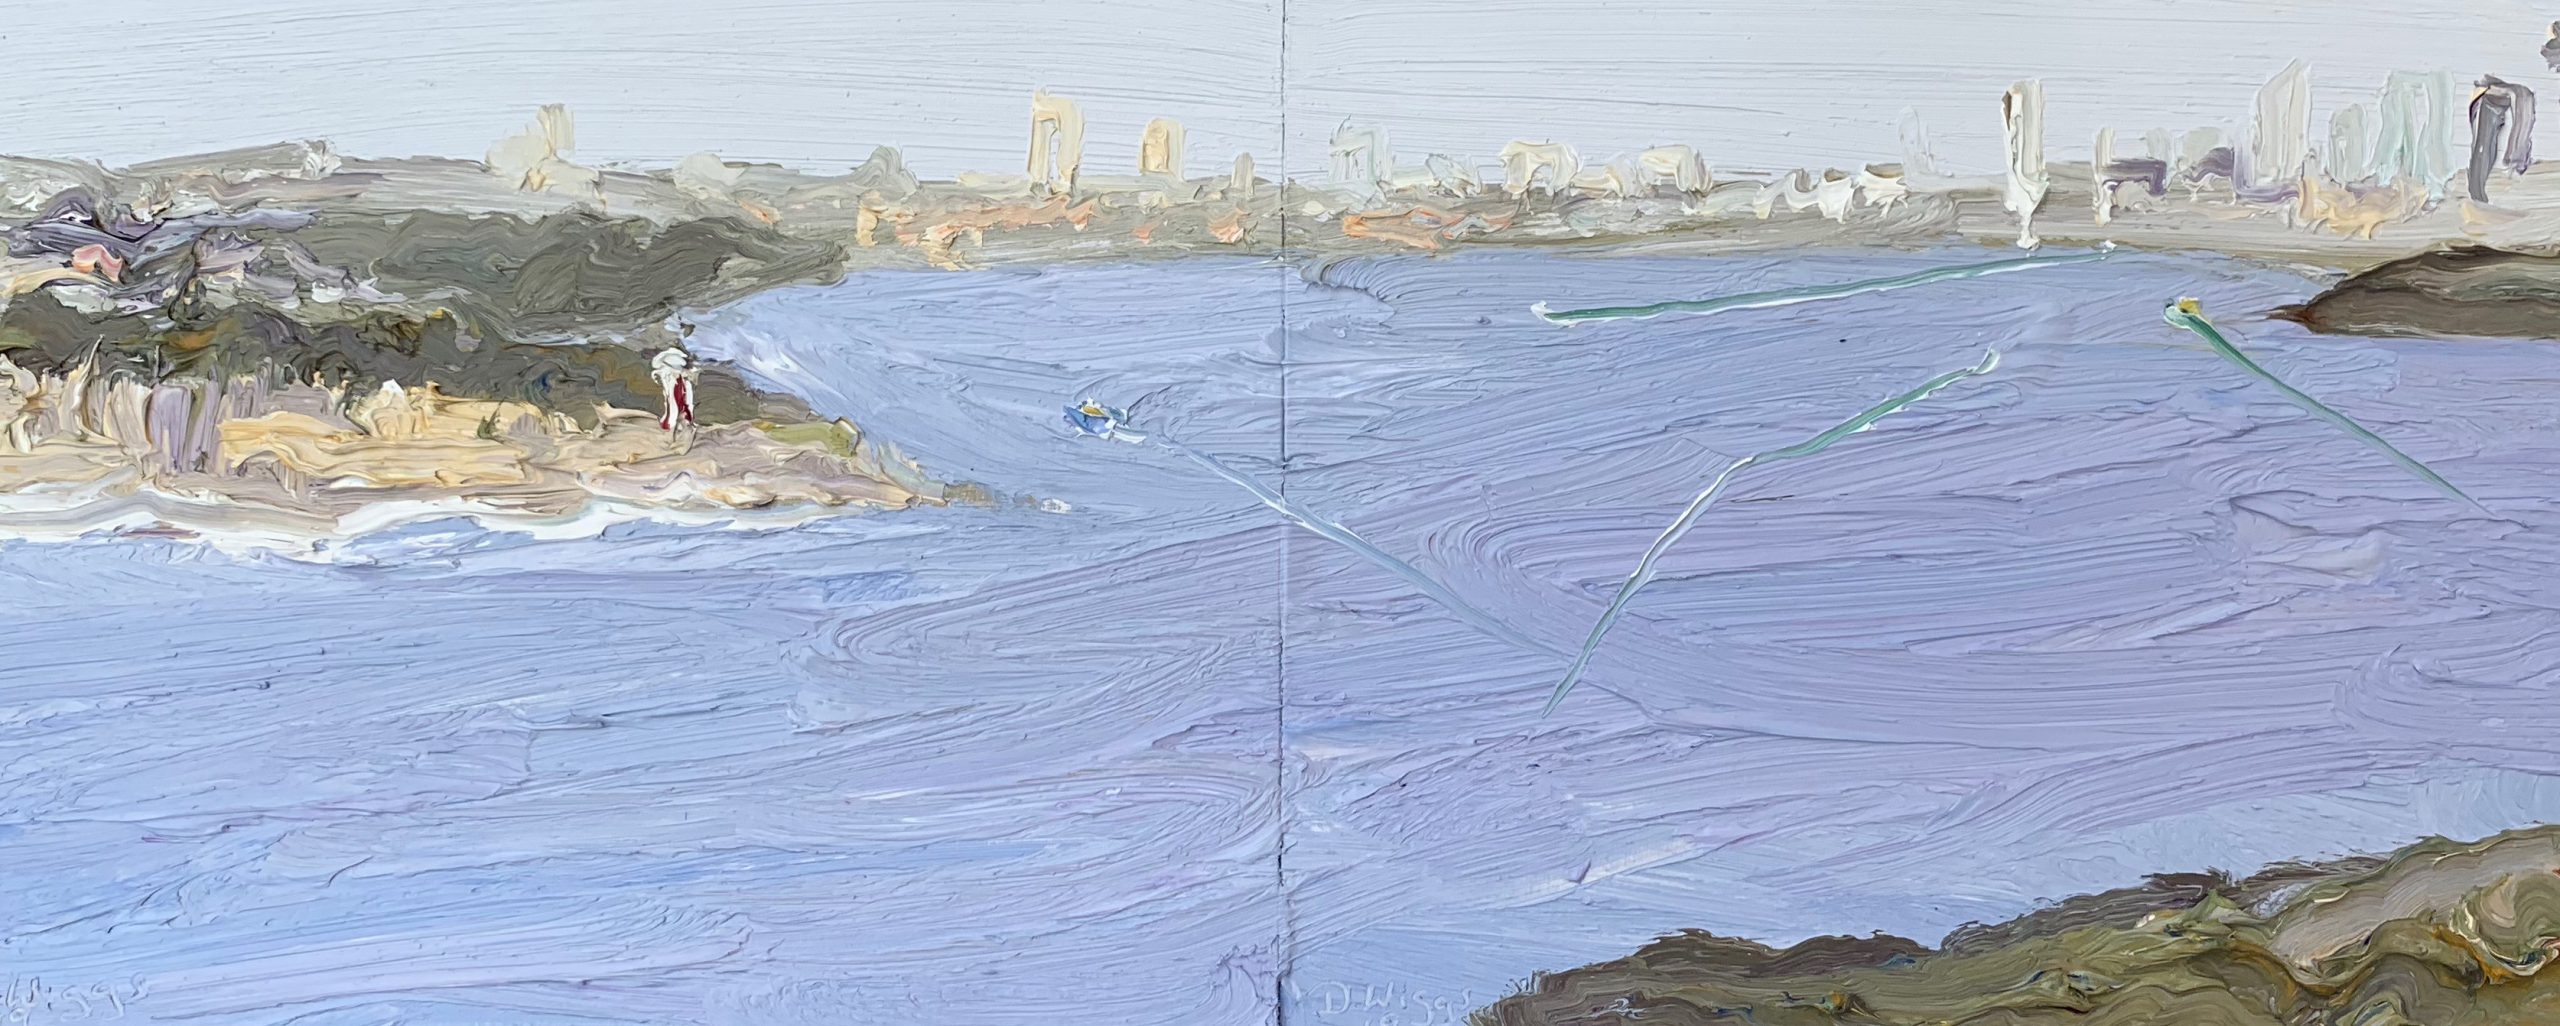 Grey Harbour-Plein air-Diptych-Oil on oil paper-50cm x 80cm framed-David K Wiggs 2019